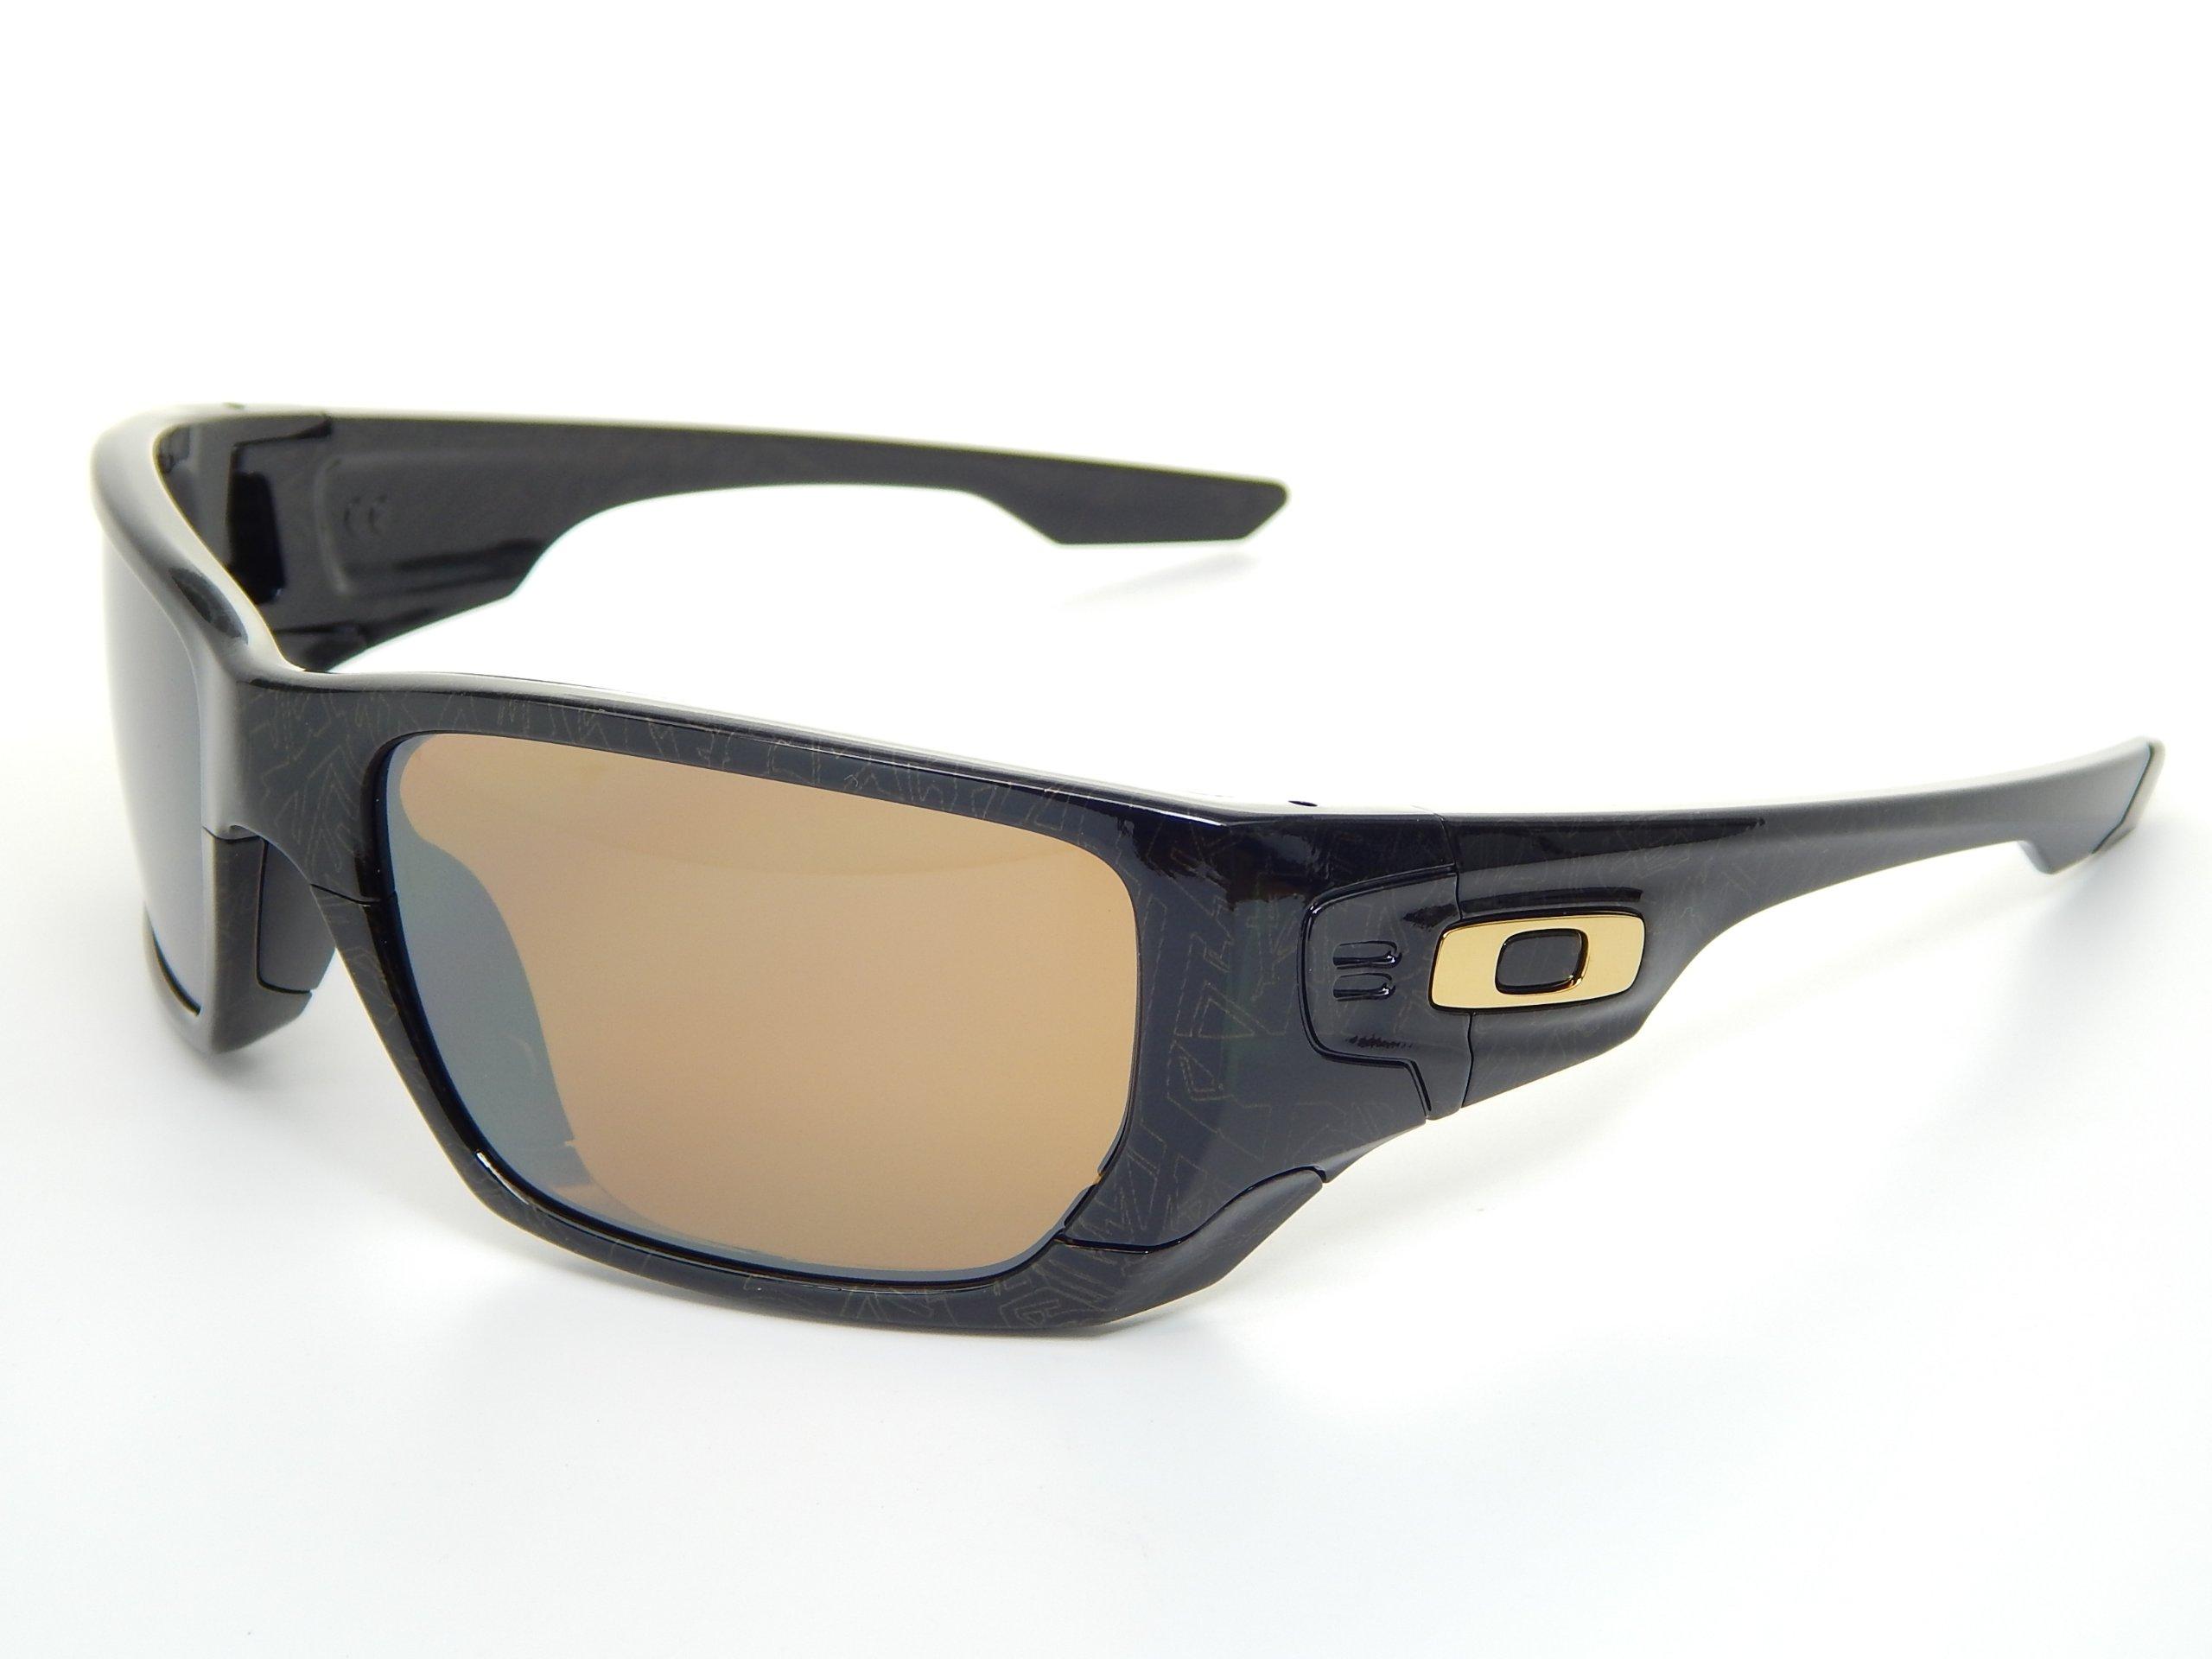 Oakley SS 9194-05 Black/Gold Ghost Text/Tungsten Iridium & Black Iridium Sunglasses by Oakley